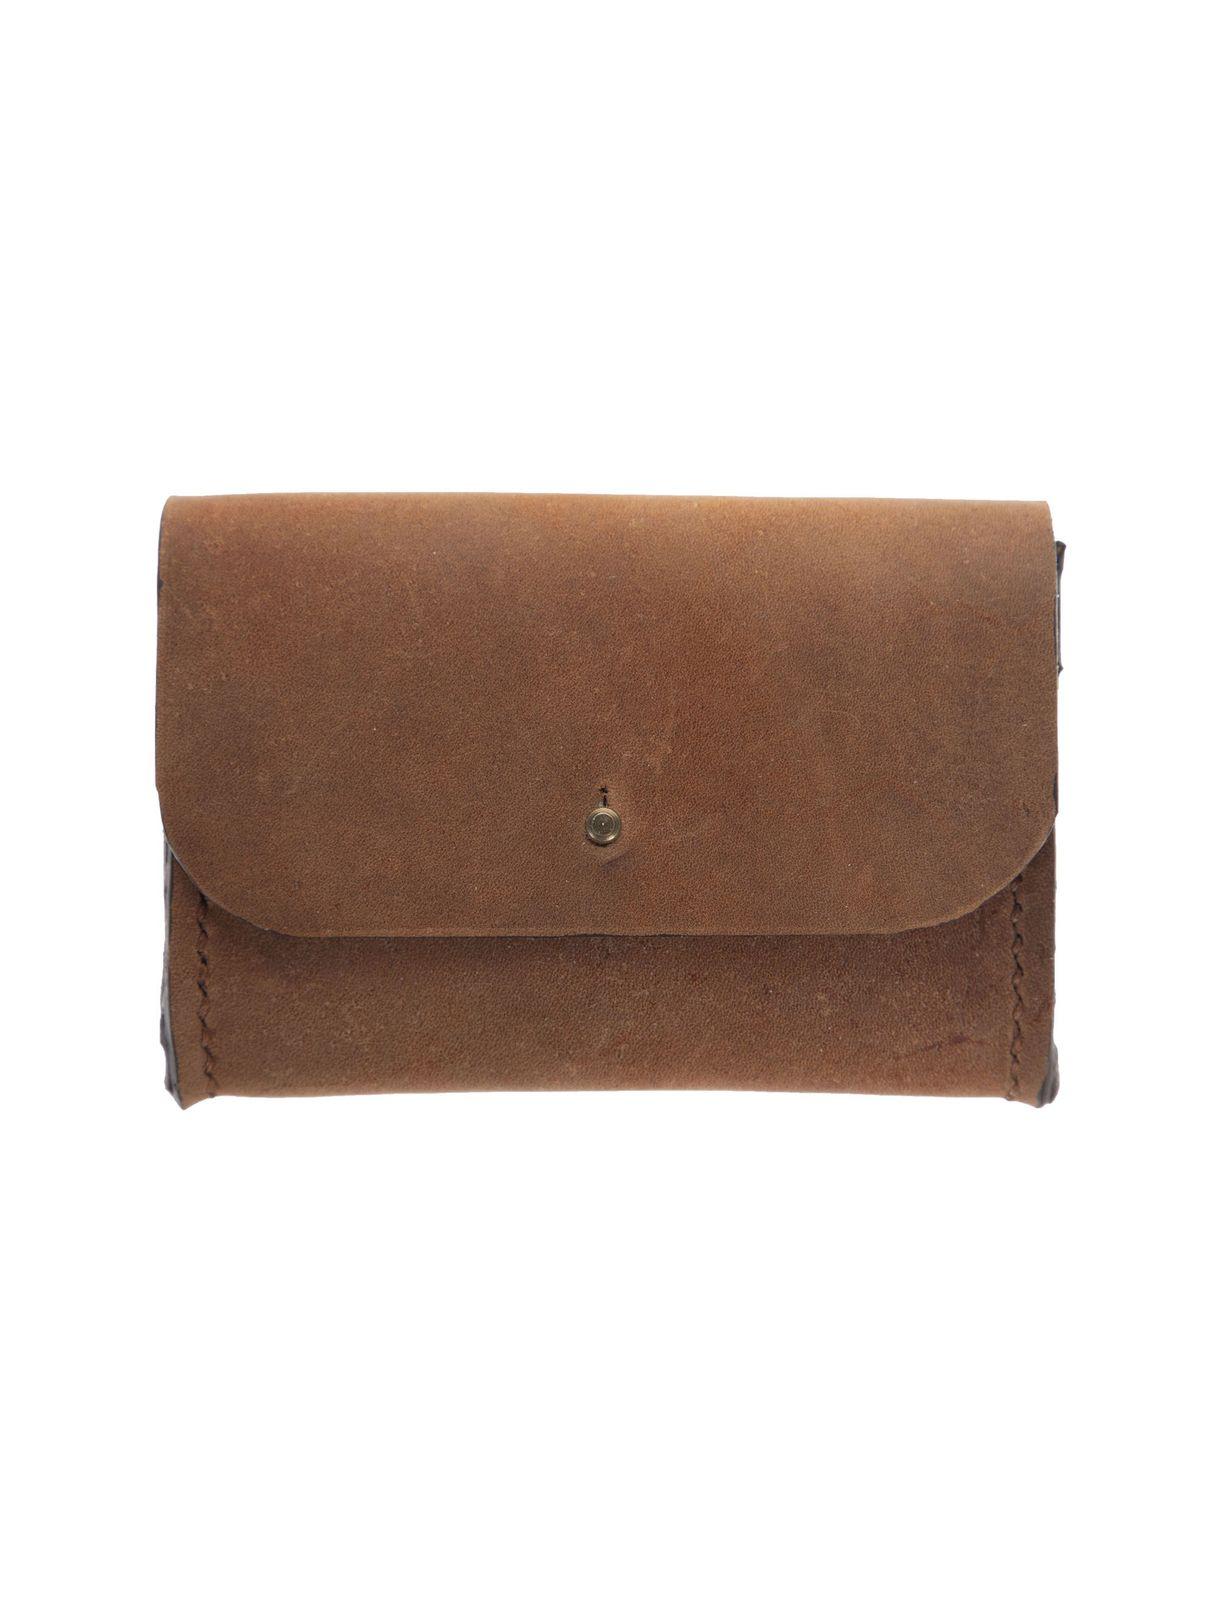 کیف کارت اعتباری چرم بزرگسال - چرم لانکا تک سایز main 1 1